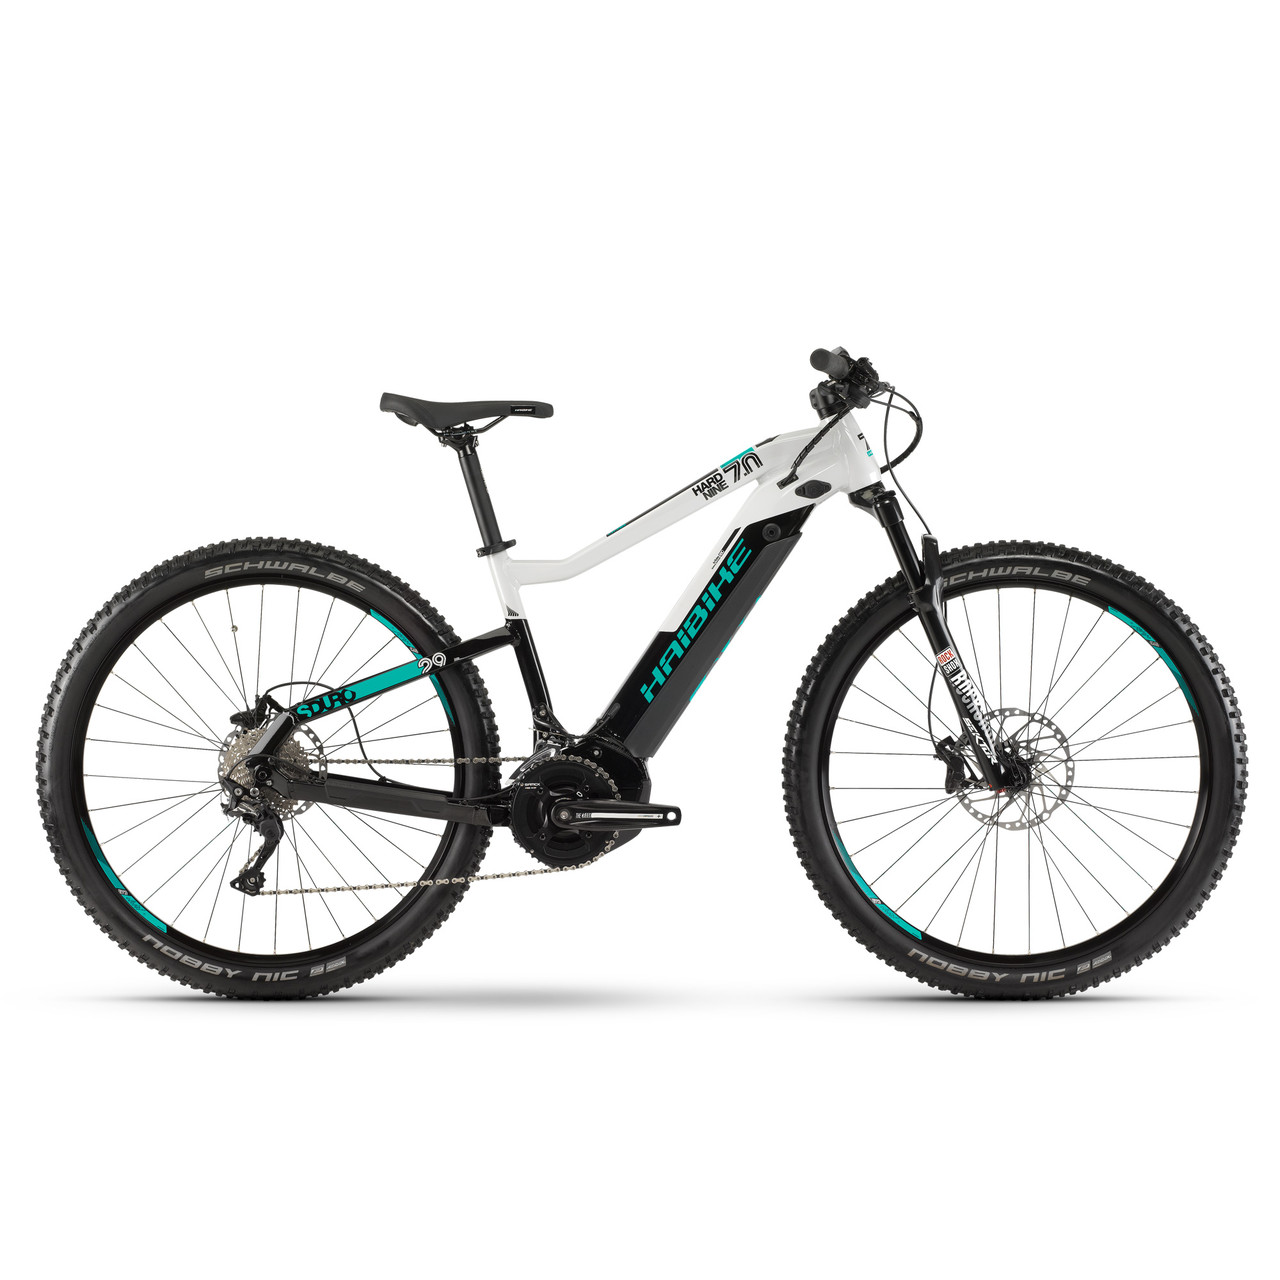 "Электровелосипед Haibike SDURO HardNine 7.0 i500Wh Deore 19 HB YCS 29"", рама M, черно-серо-бирюзовый, 2019"